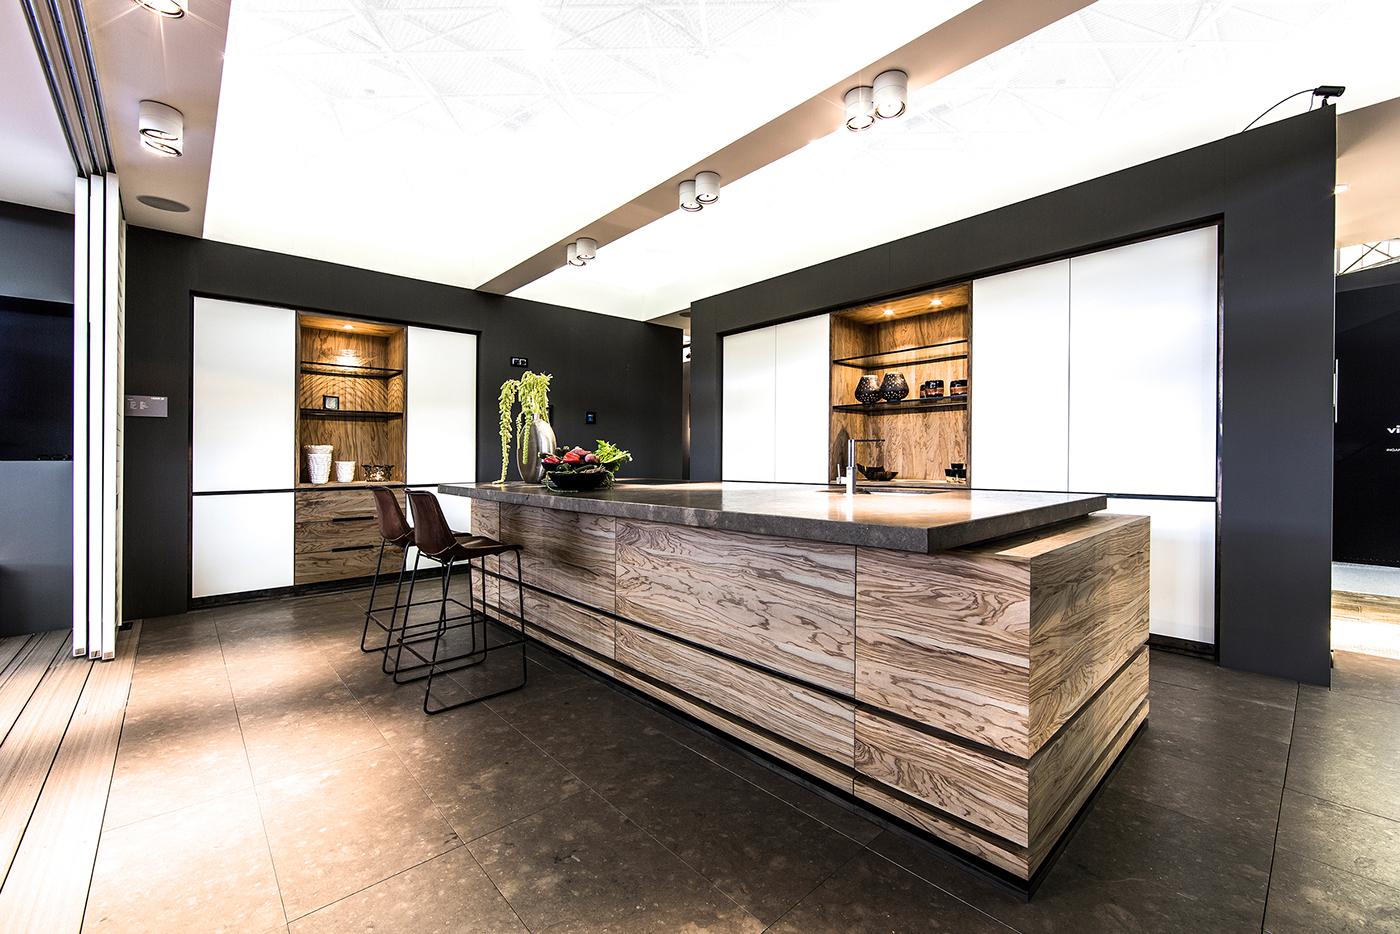 Oliva Kitchen Design For Tinello On Behance